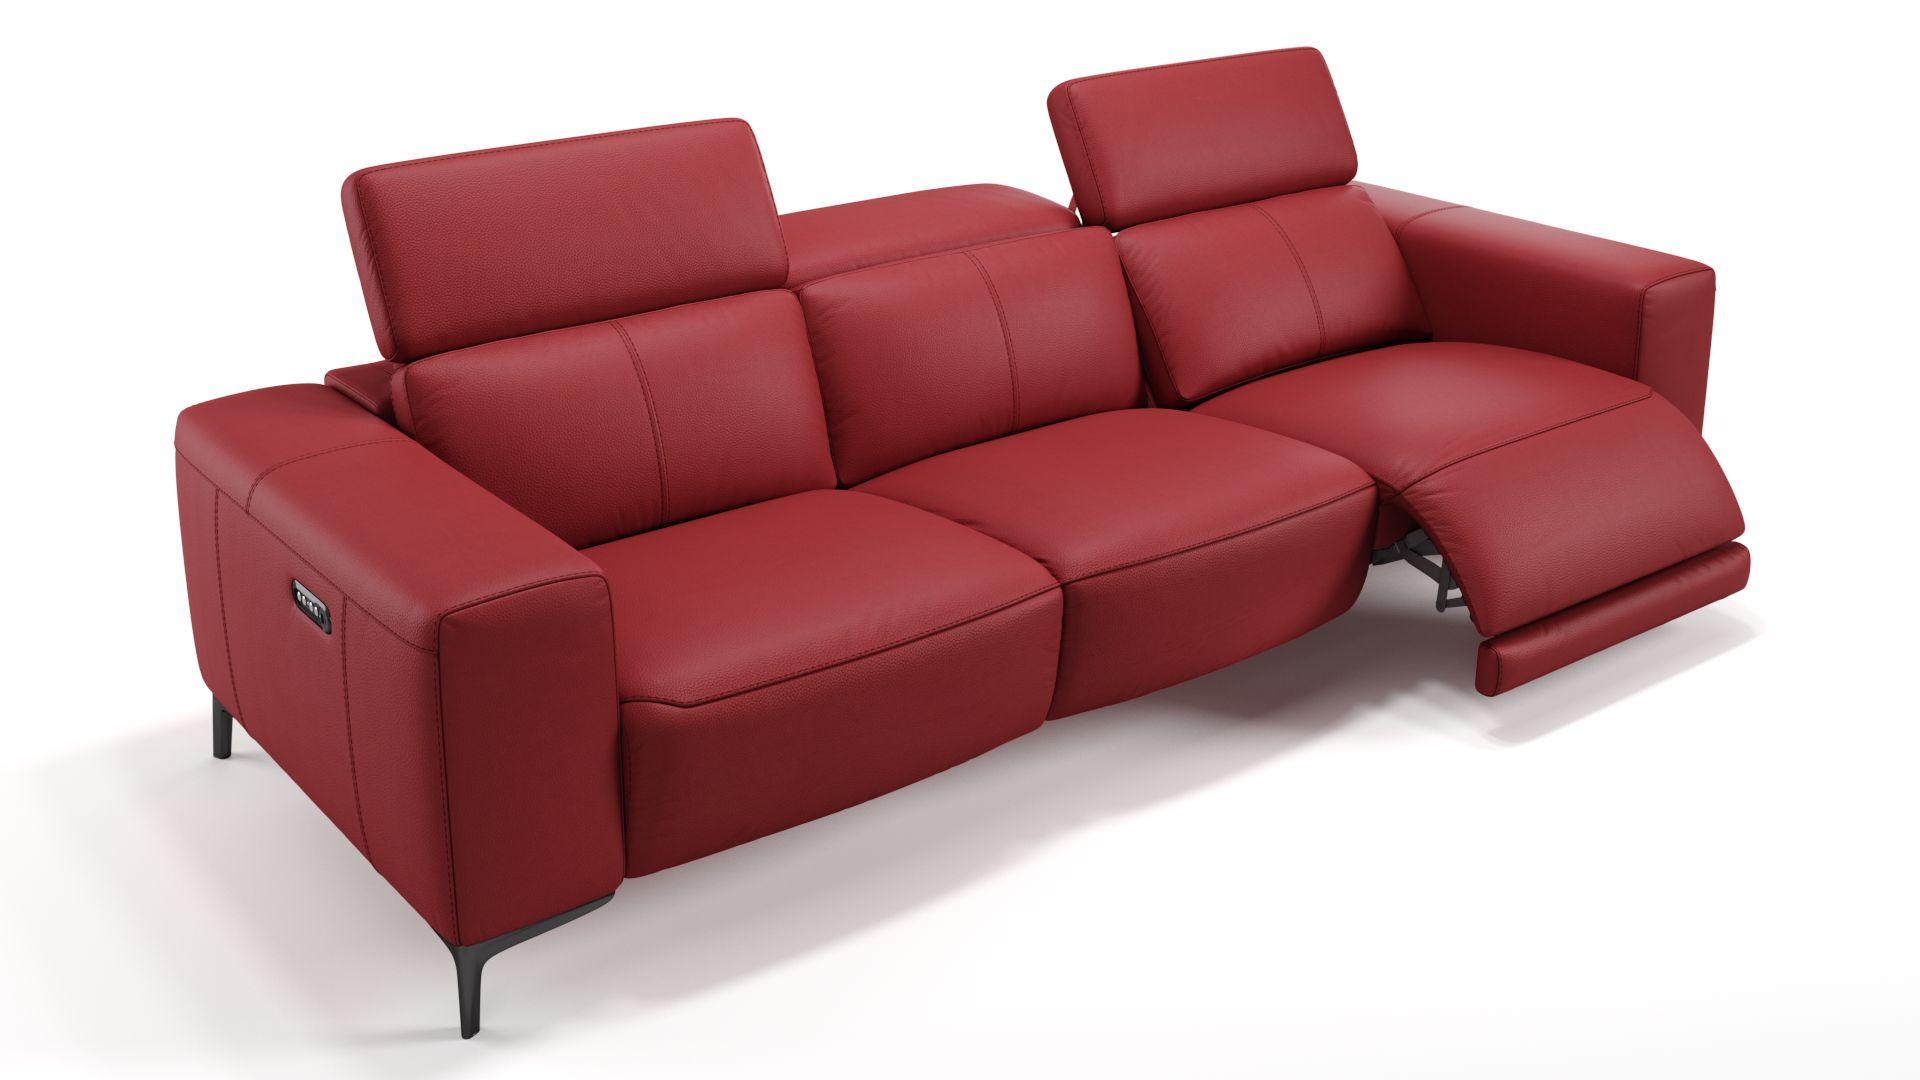 Leder 3-Sitzer Sofa XXL BORRELLO